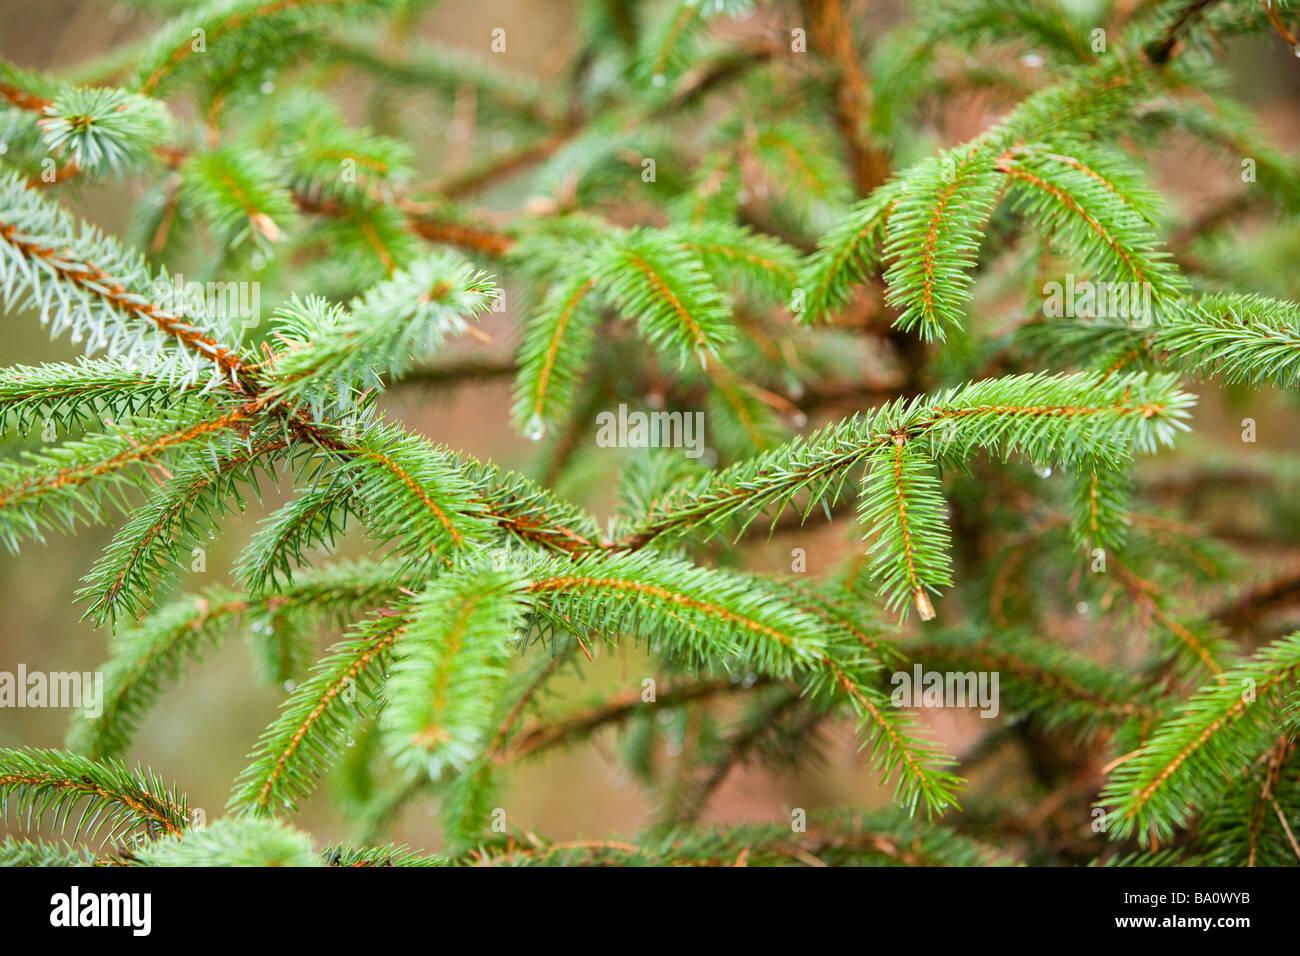 Close up of Douglas Fir pine tree and pine needles UK - Stock Image